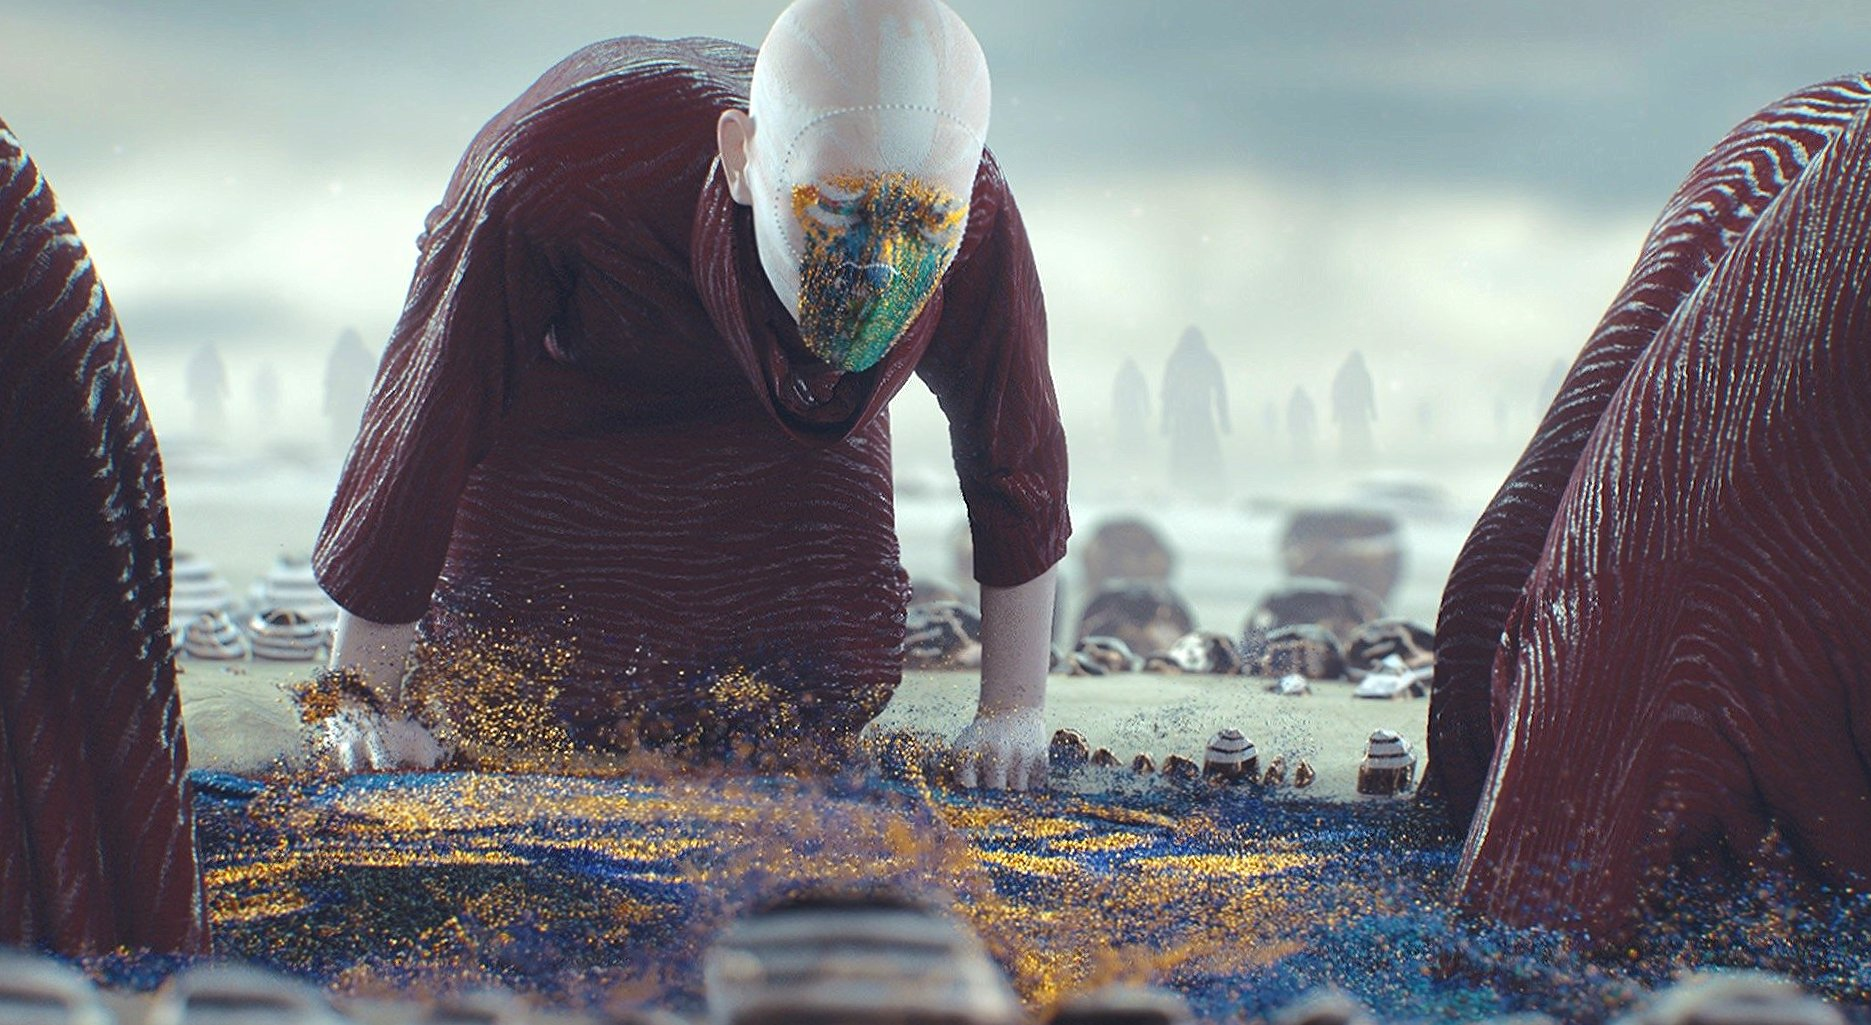 CGI wallpapers HD quality